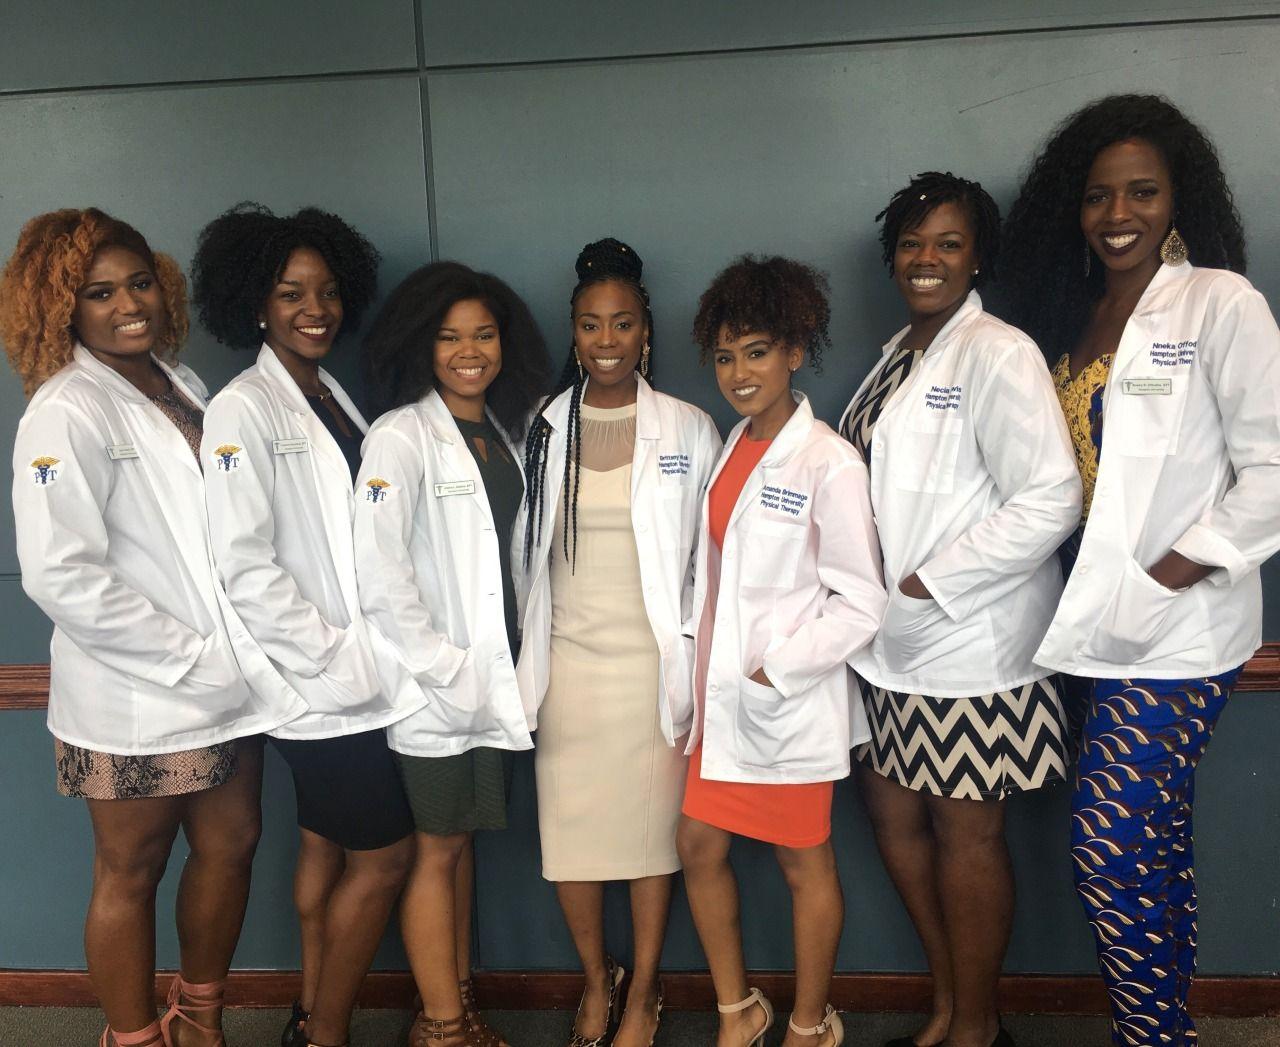 Black fashion hampton university doctor of physical